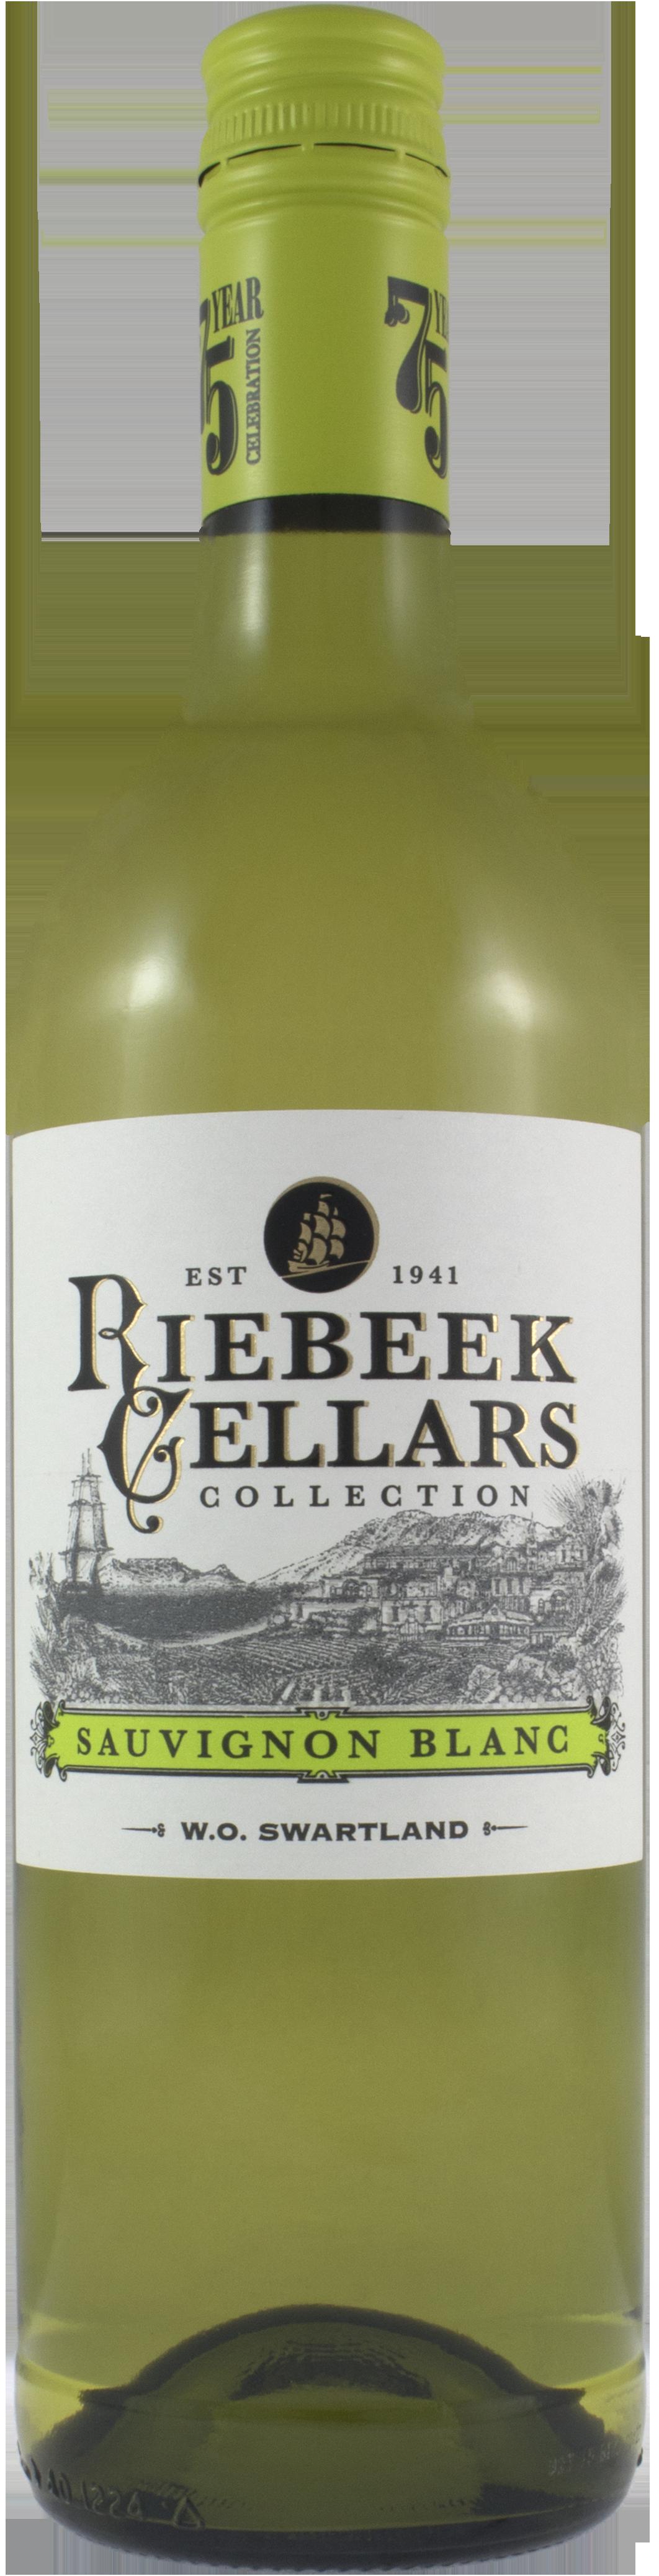 Iphone label thumb ... & 2016 Riebeek Cellars Sauvignon Blanc | Wine Library